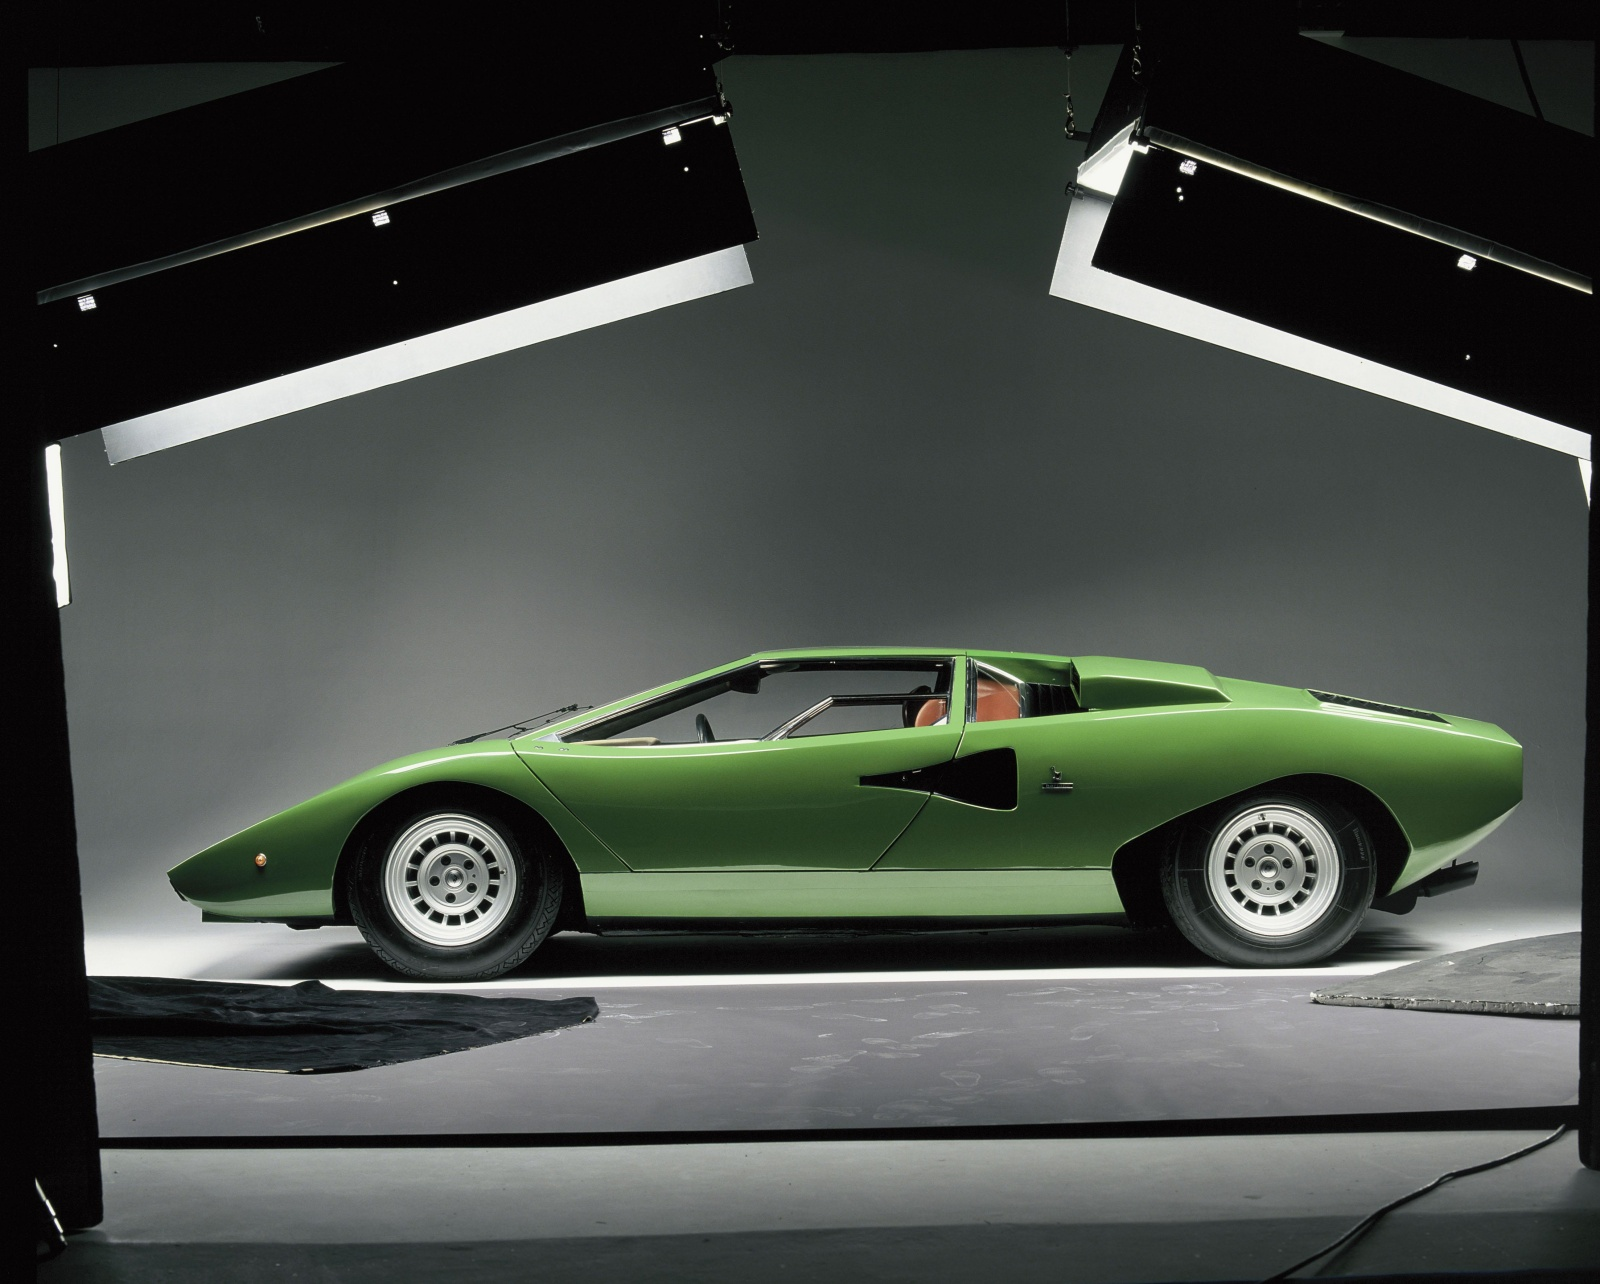 Lamborghini Countach LP 400 - bok, profil